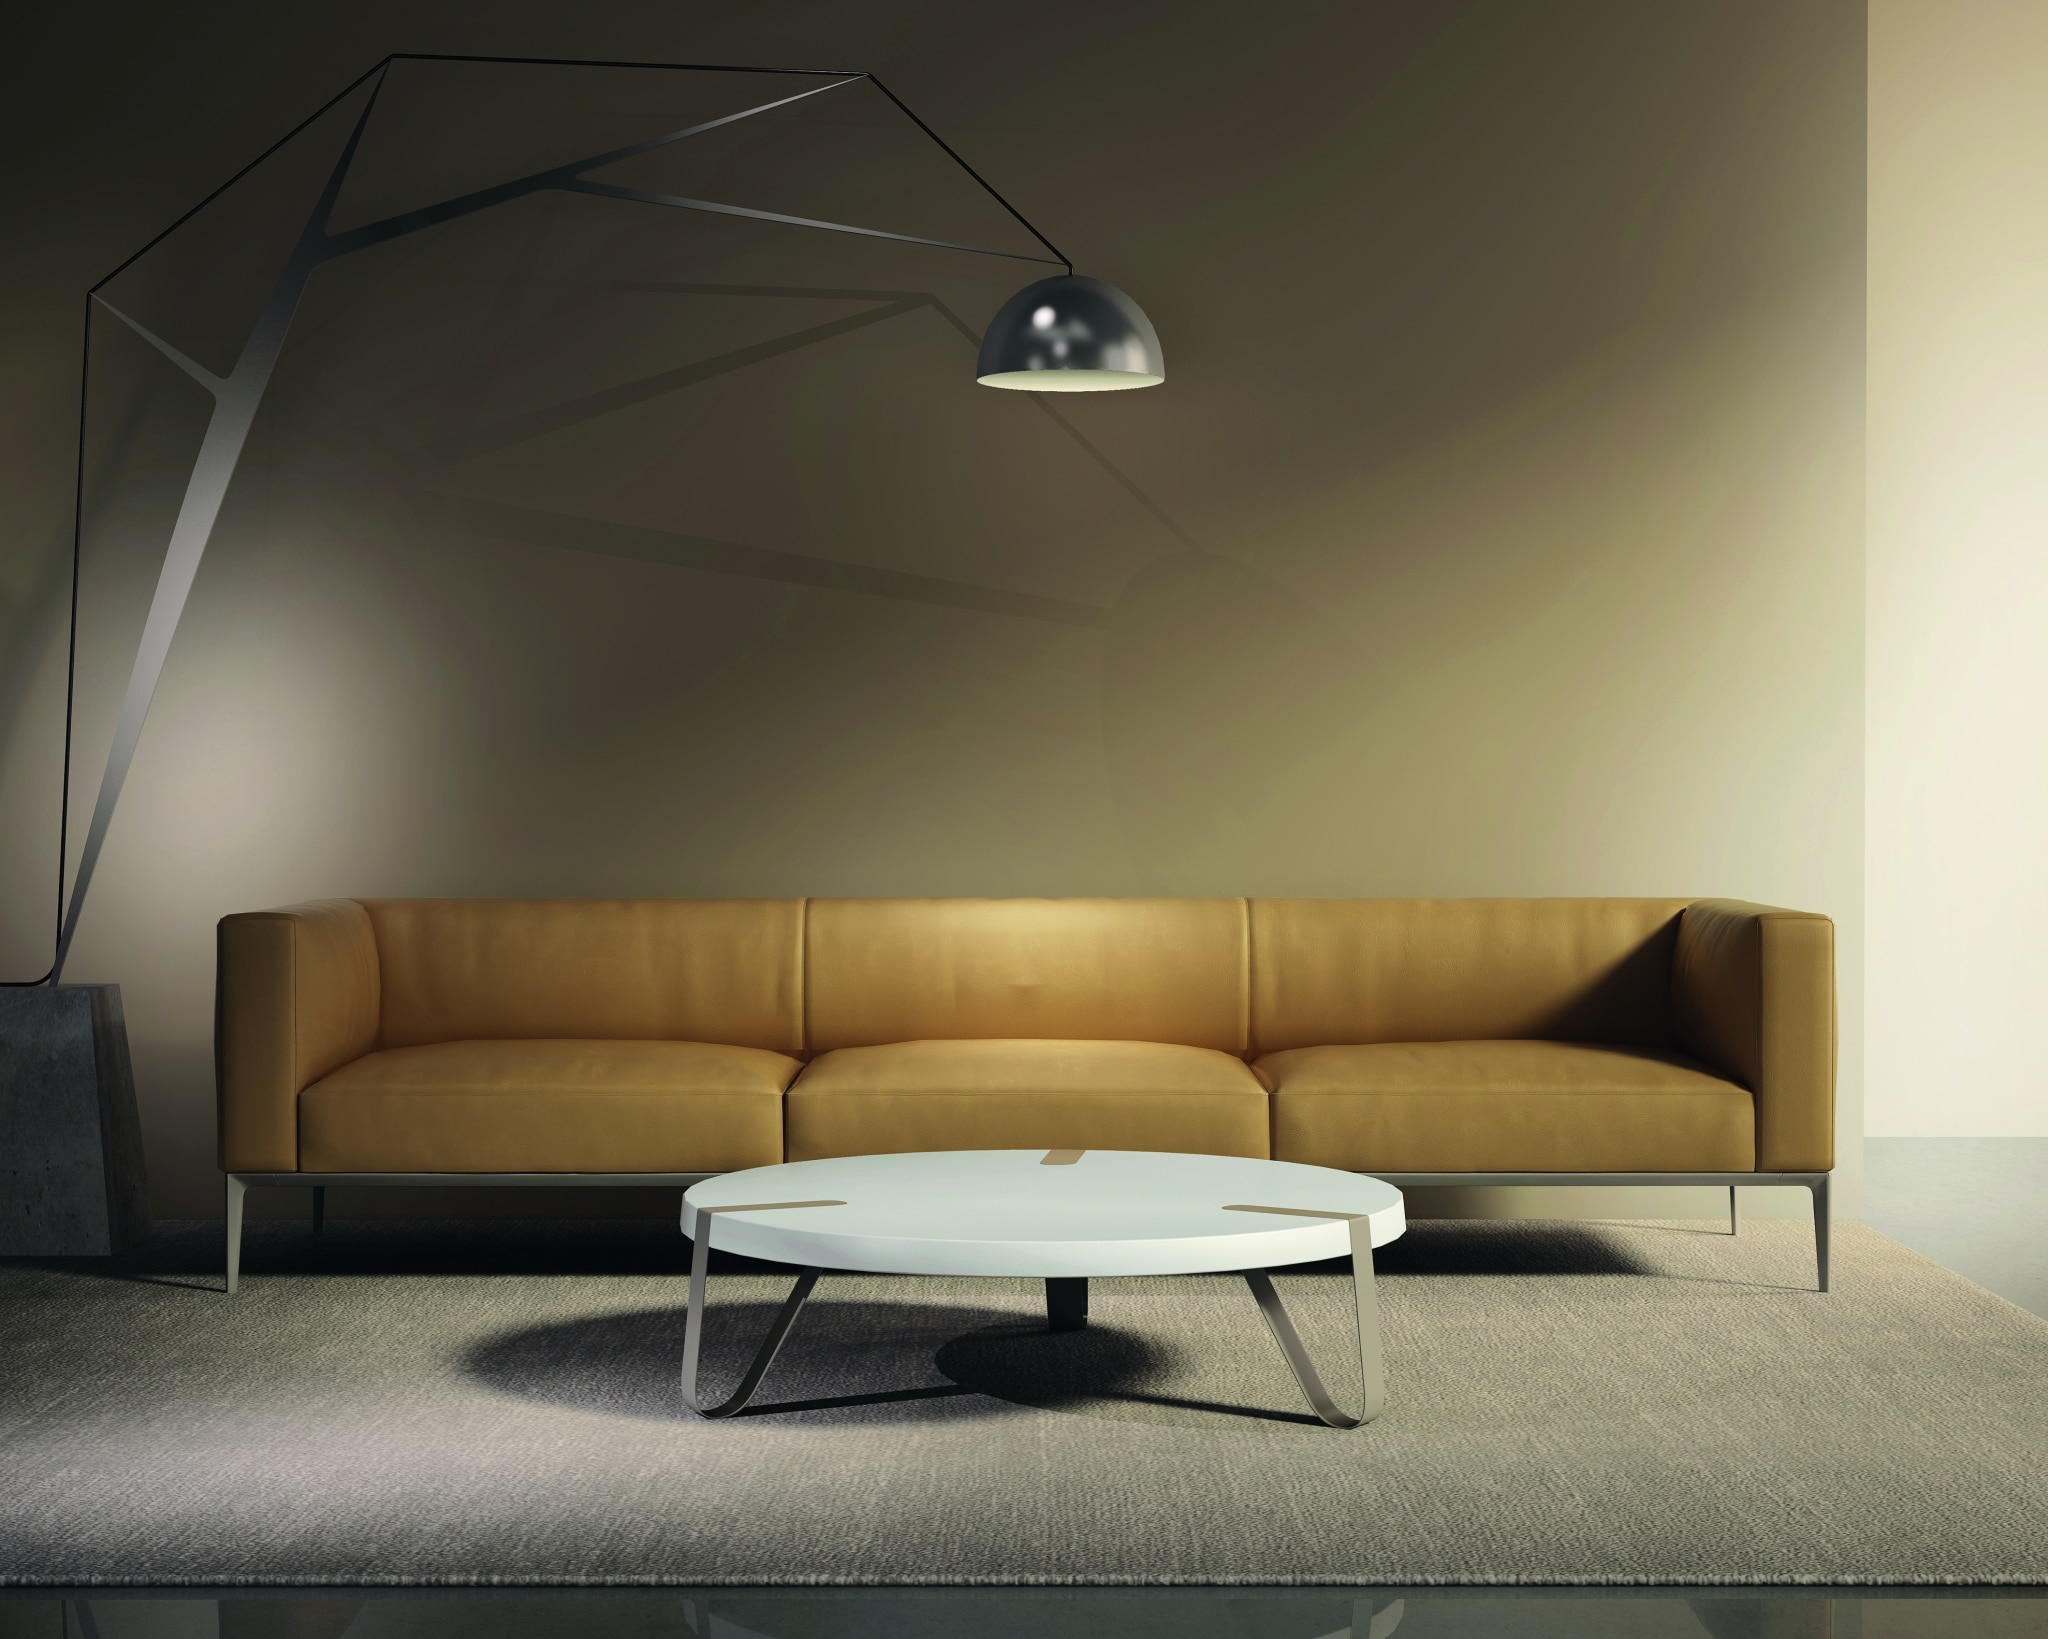 Premium furniture leather from Wollsdorf